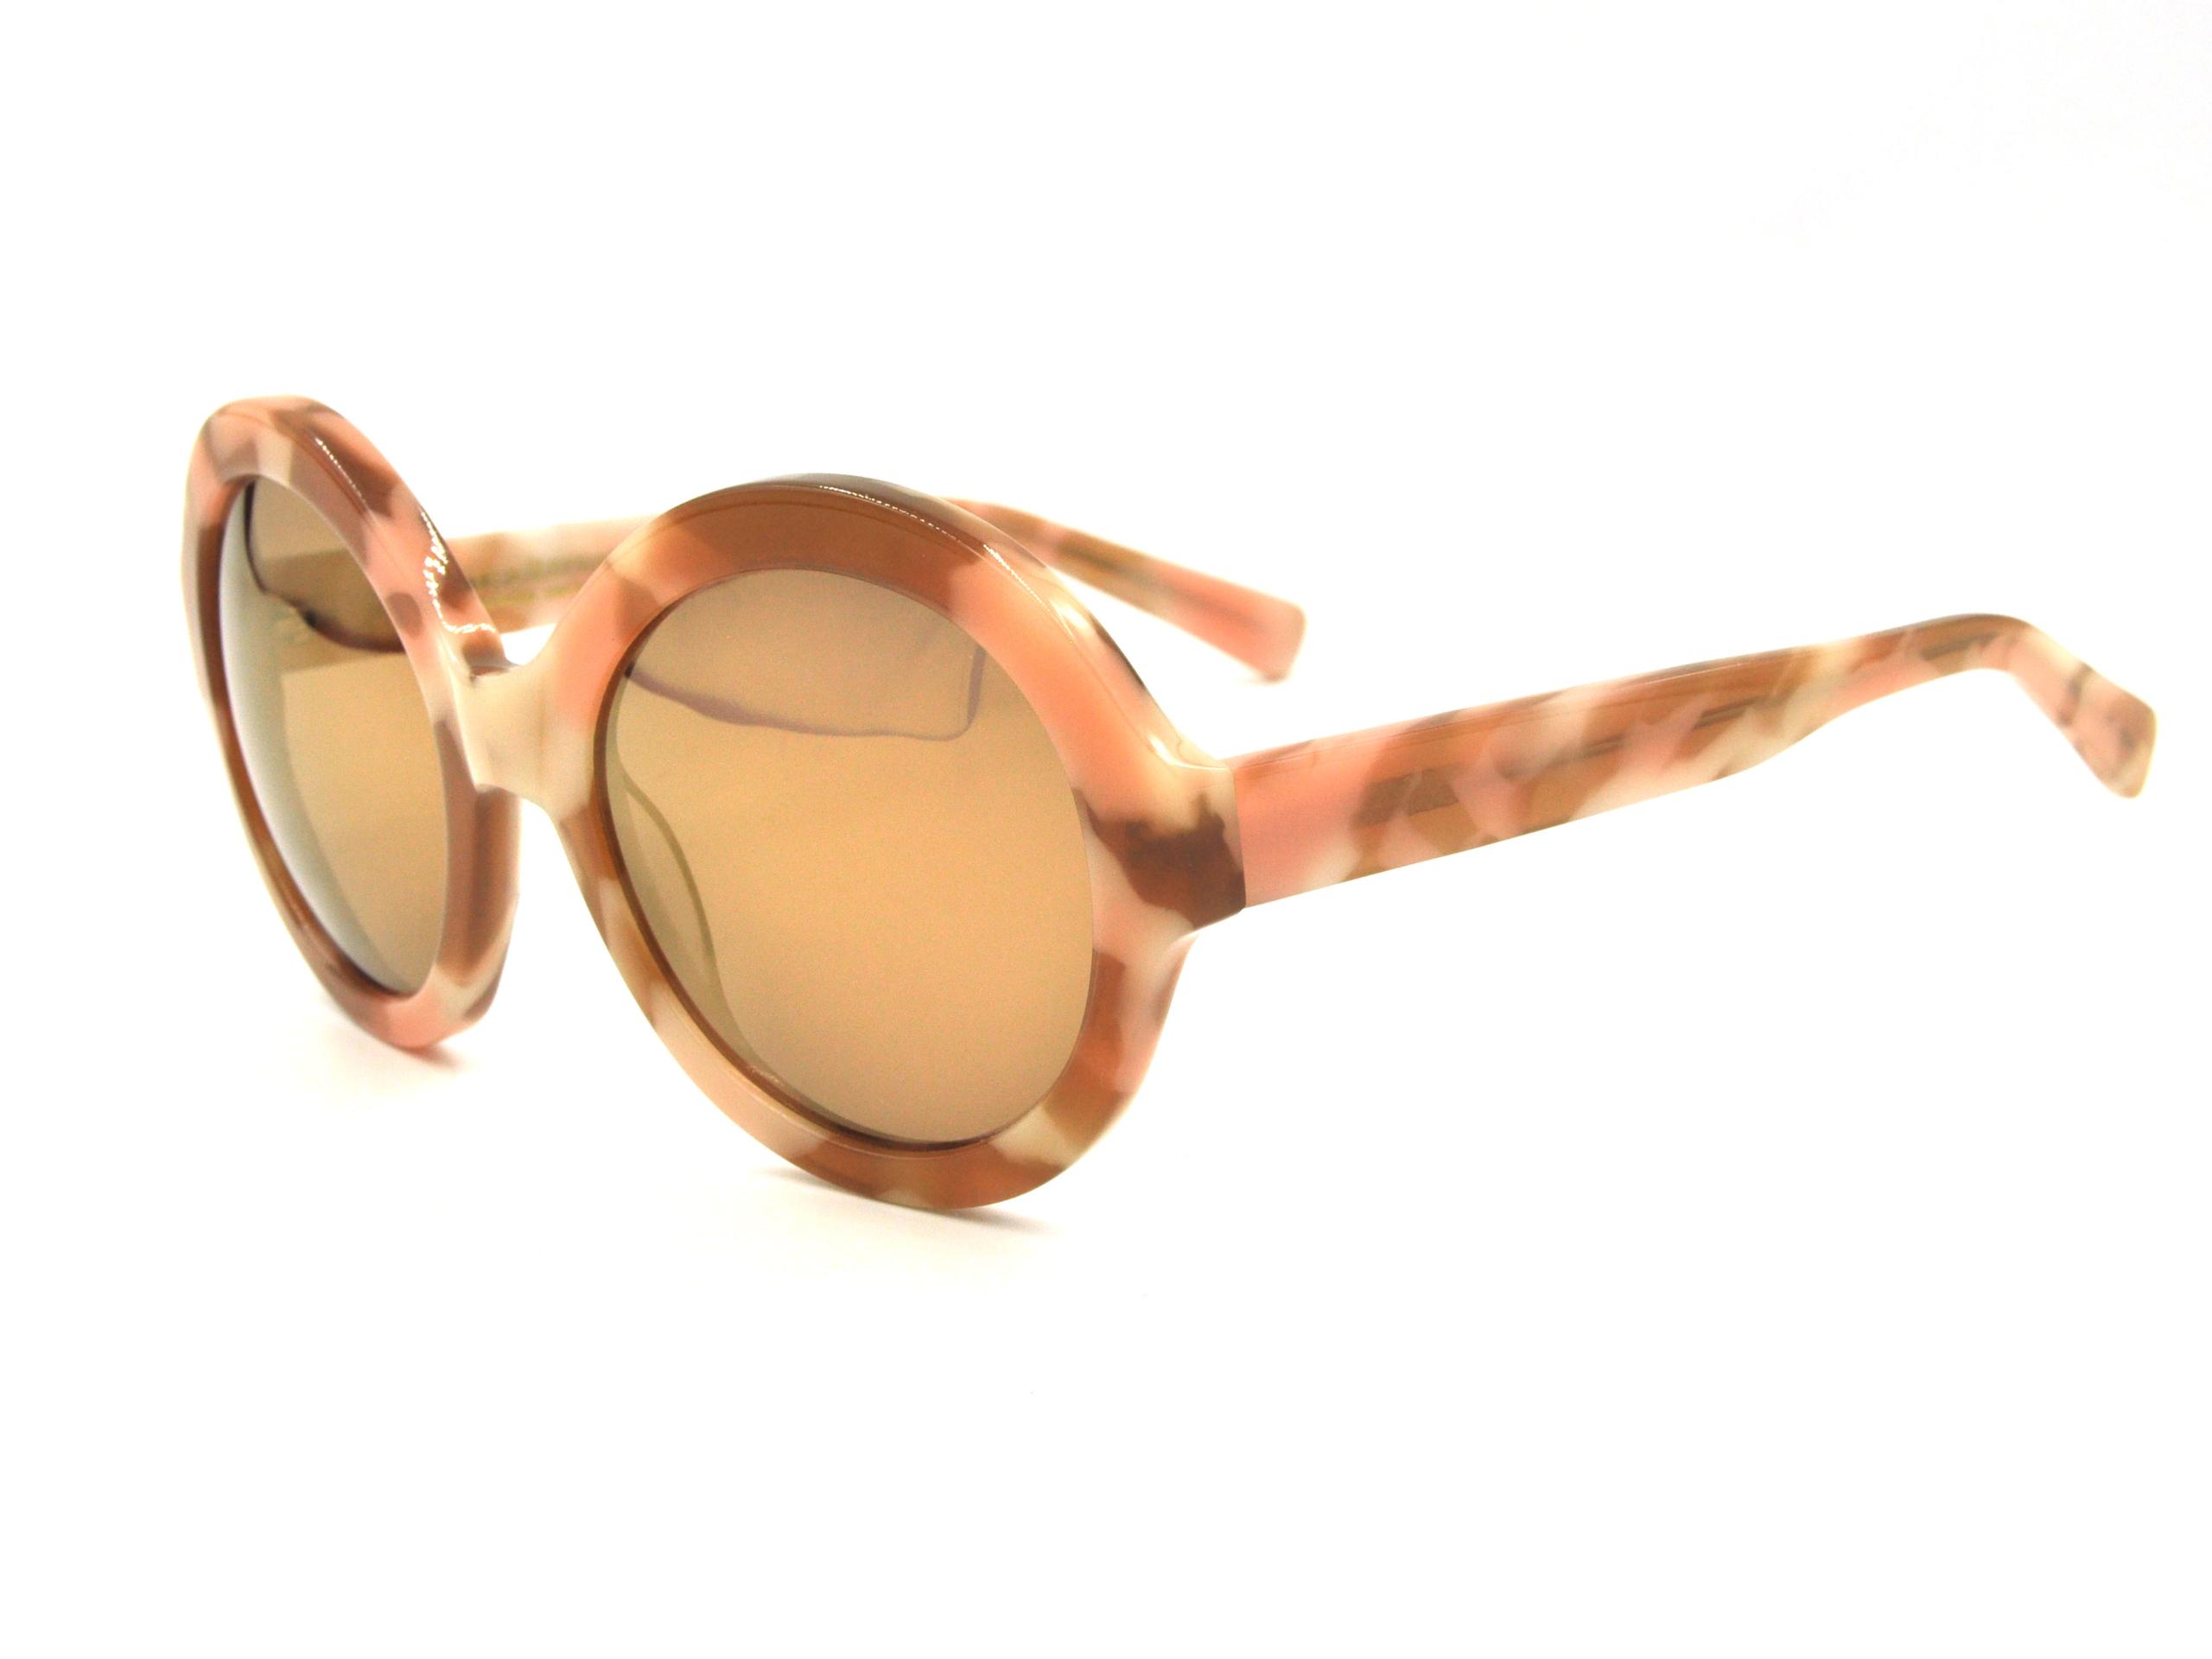 PORTER & REYNARD VIVIEN C6 Sunglasses 2020